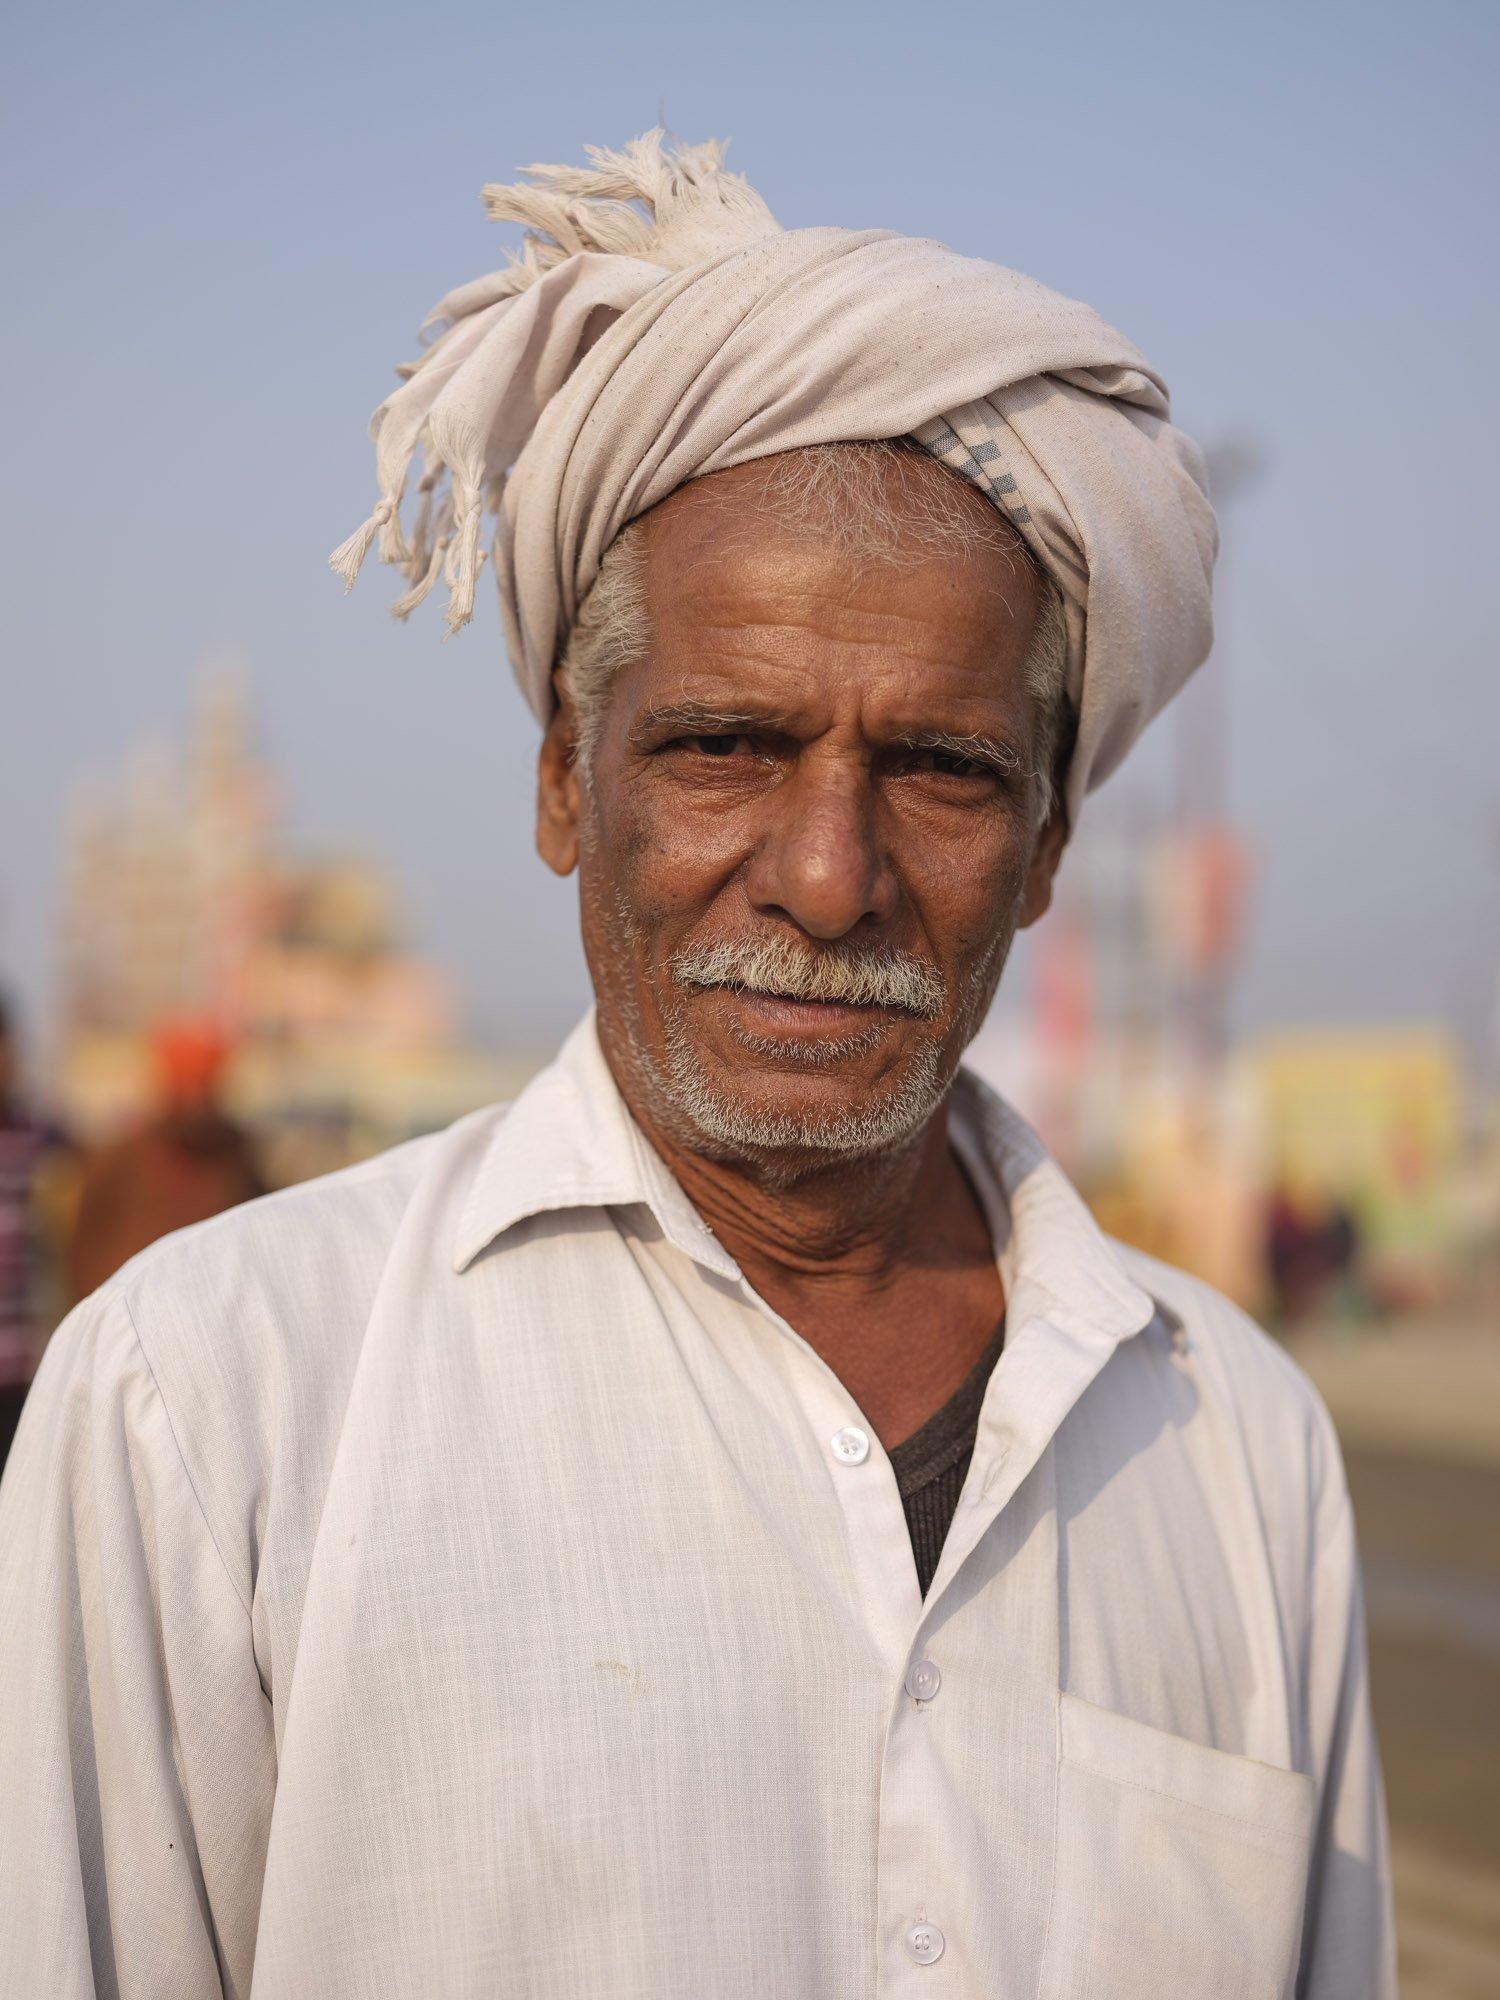 portrait pilgrims Kumbh mela 2019 India Allahabad Prayagraj Ardh hindu religious Festival event rivers photographer jose jeuland photography